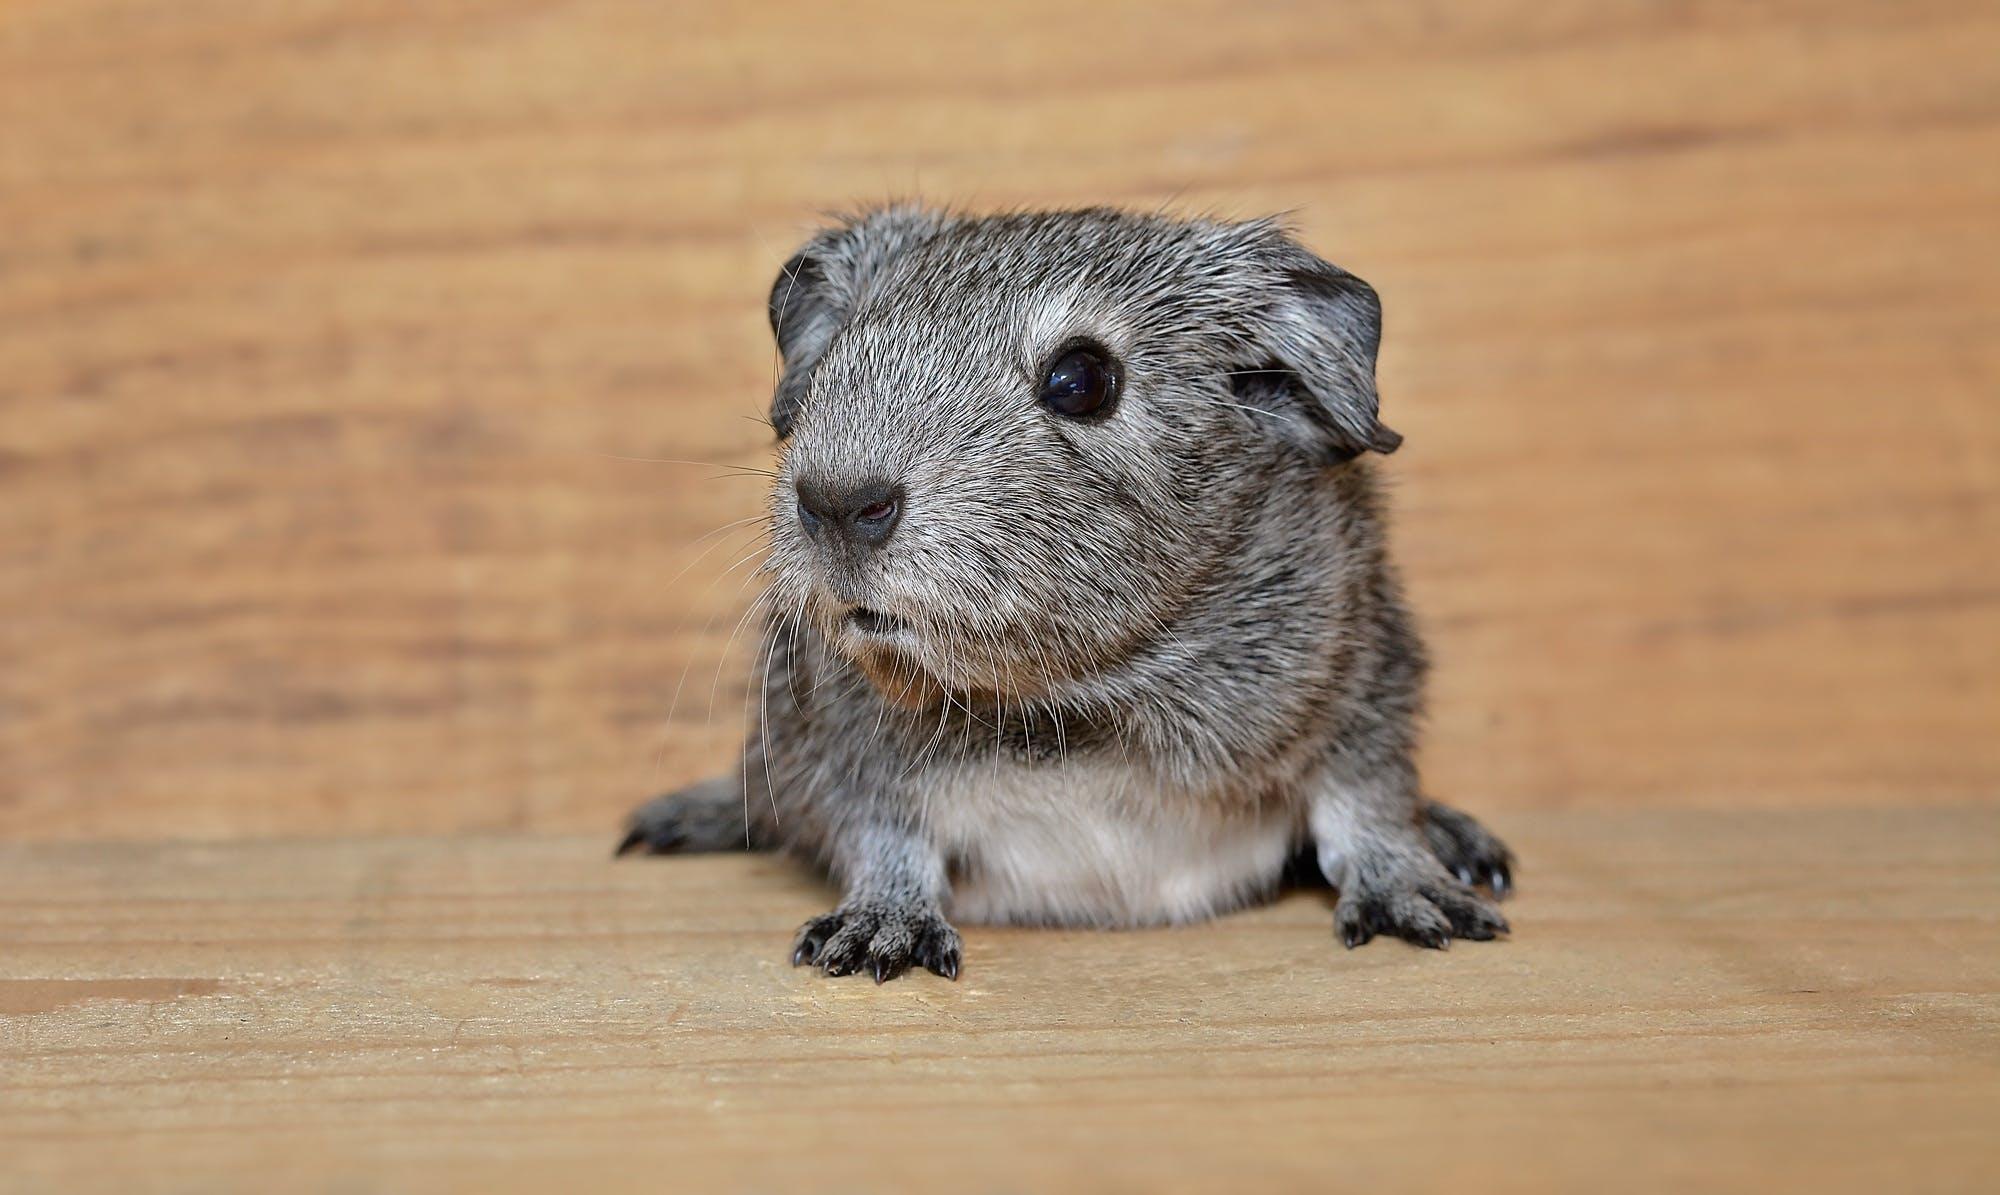 Kostenloses Stock Foto zu haustier, jungtier, kleintier, meerschweinchen